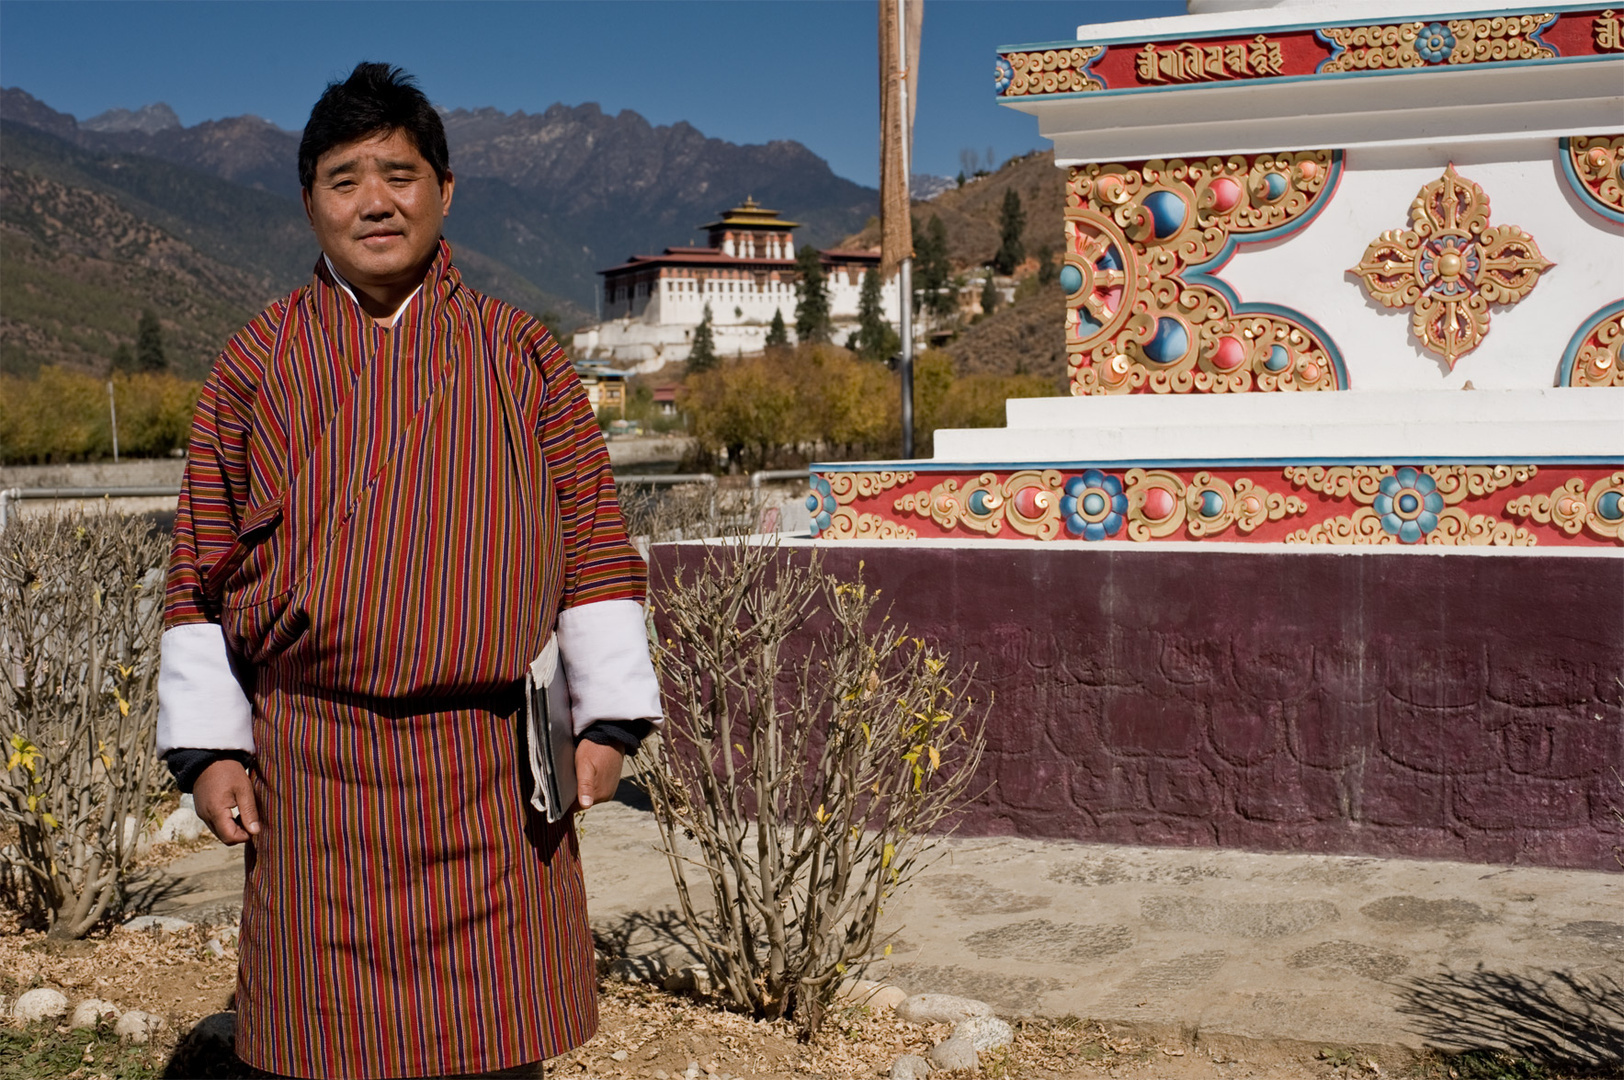 Phuntsho Dorji